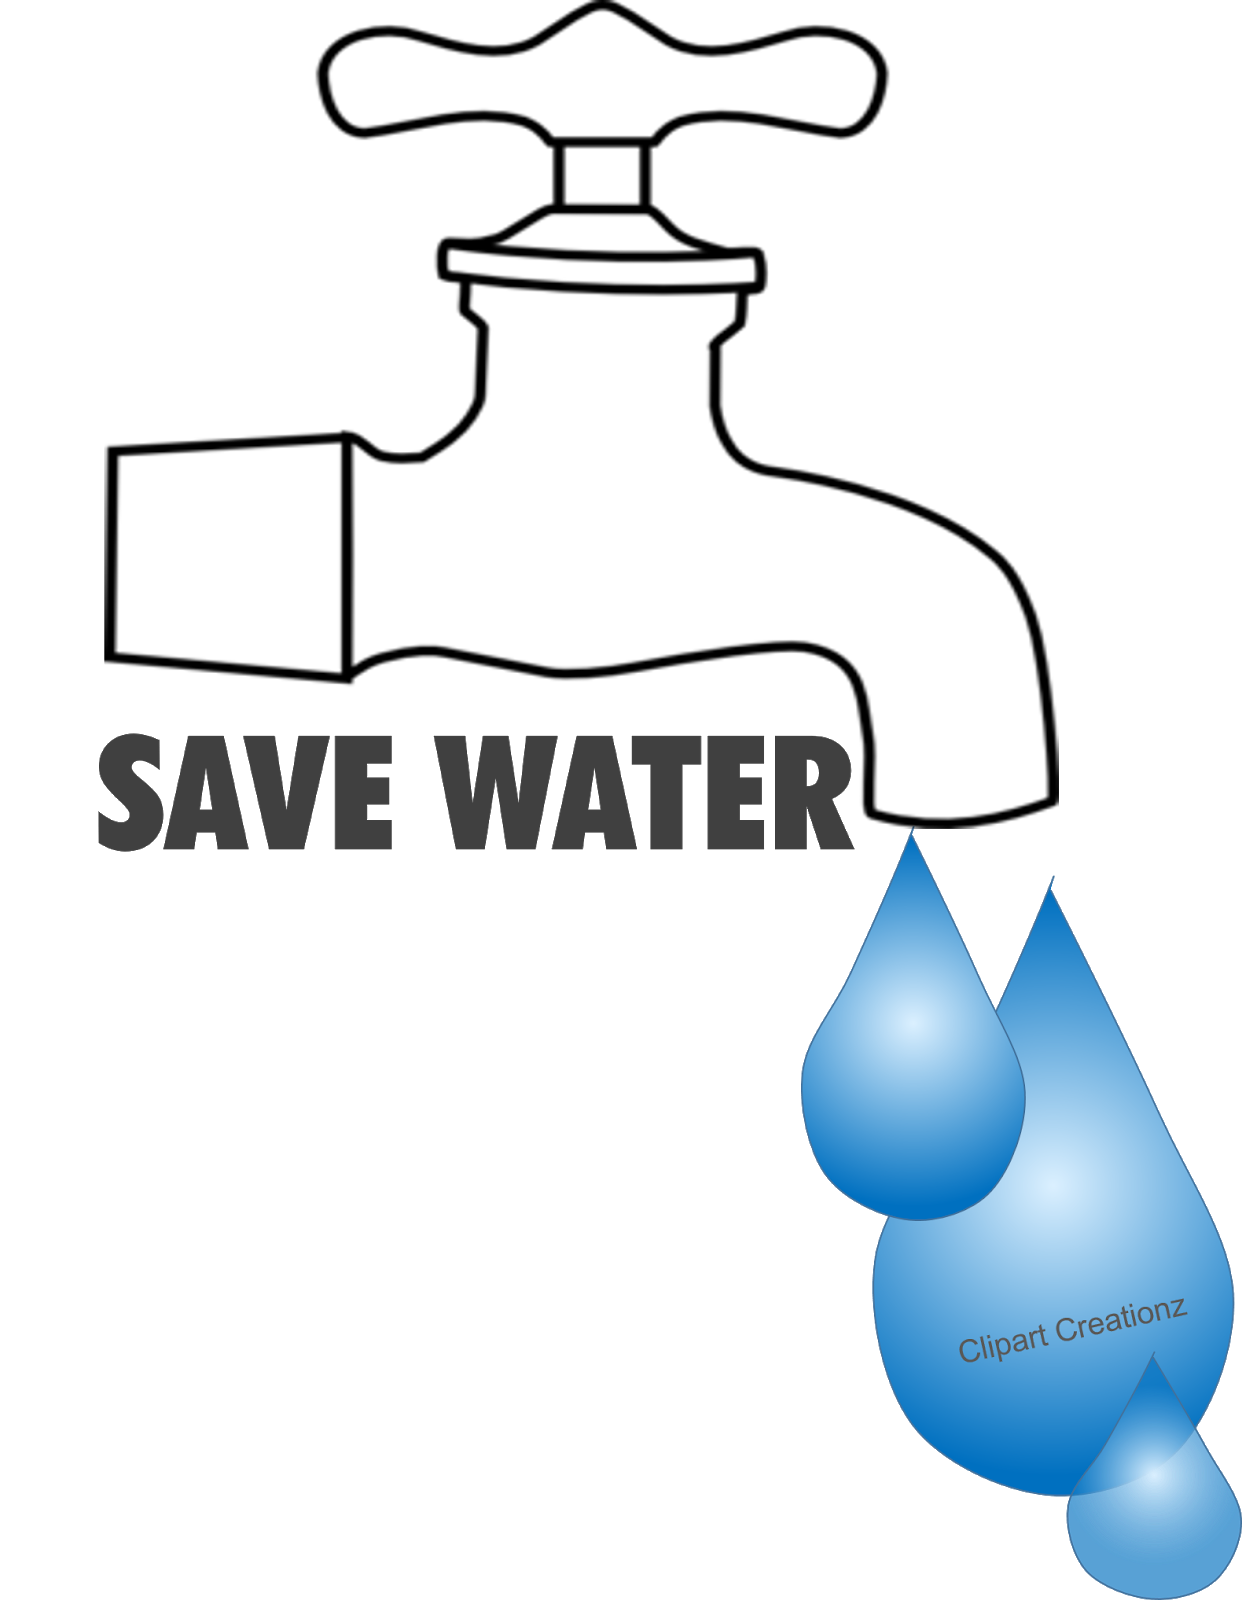 Save Water Poster Free